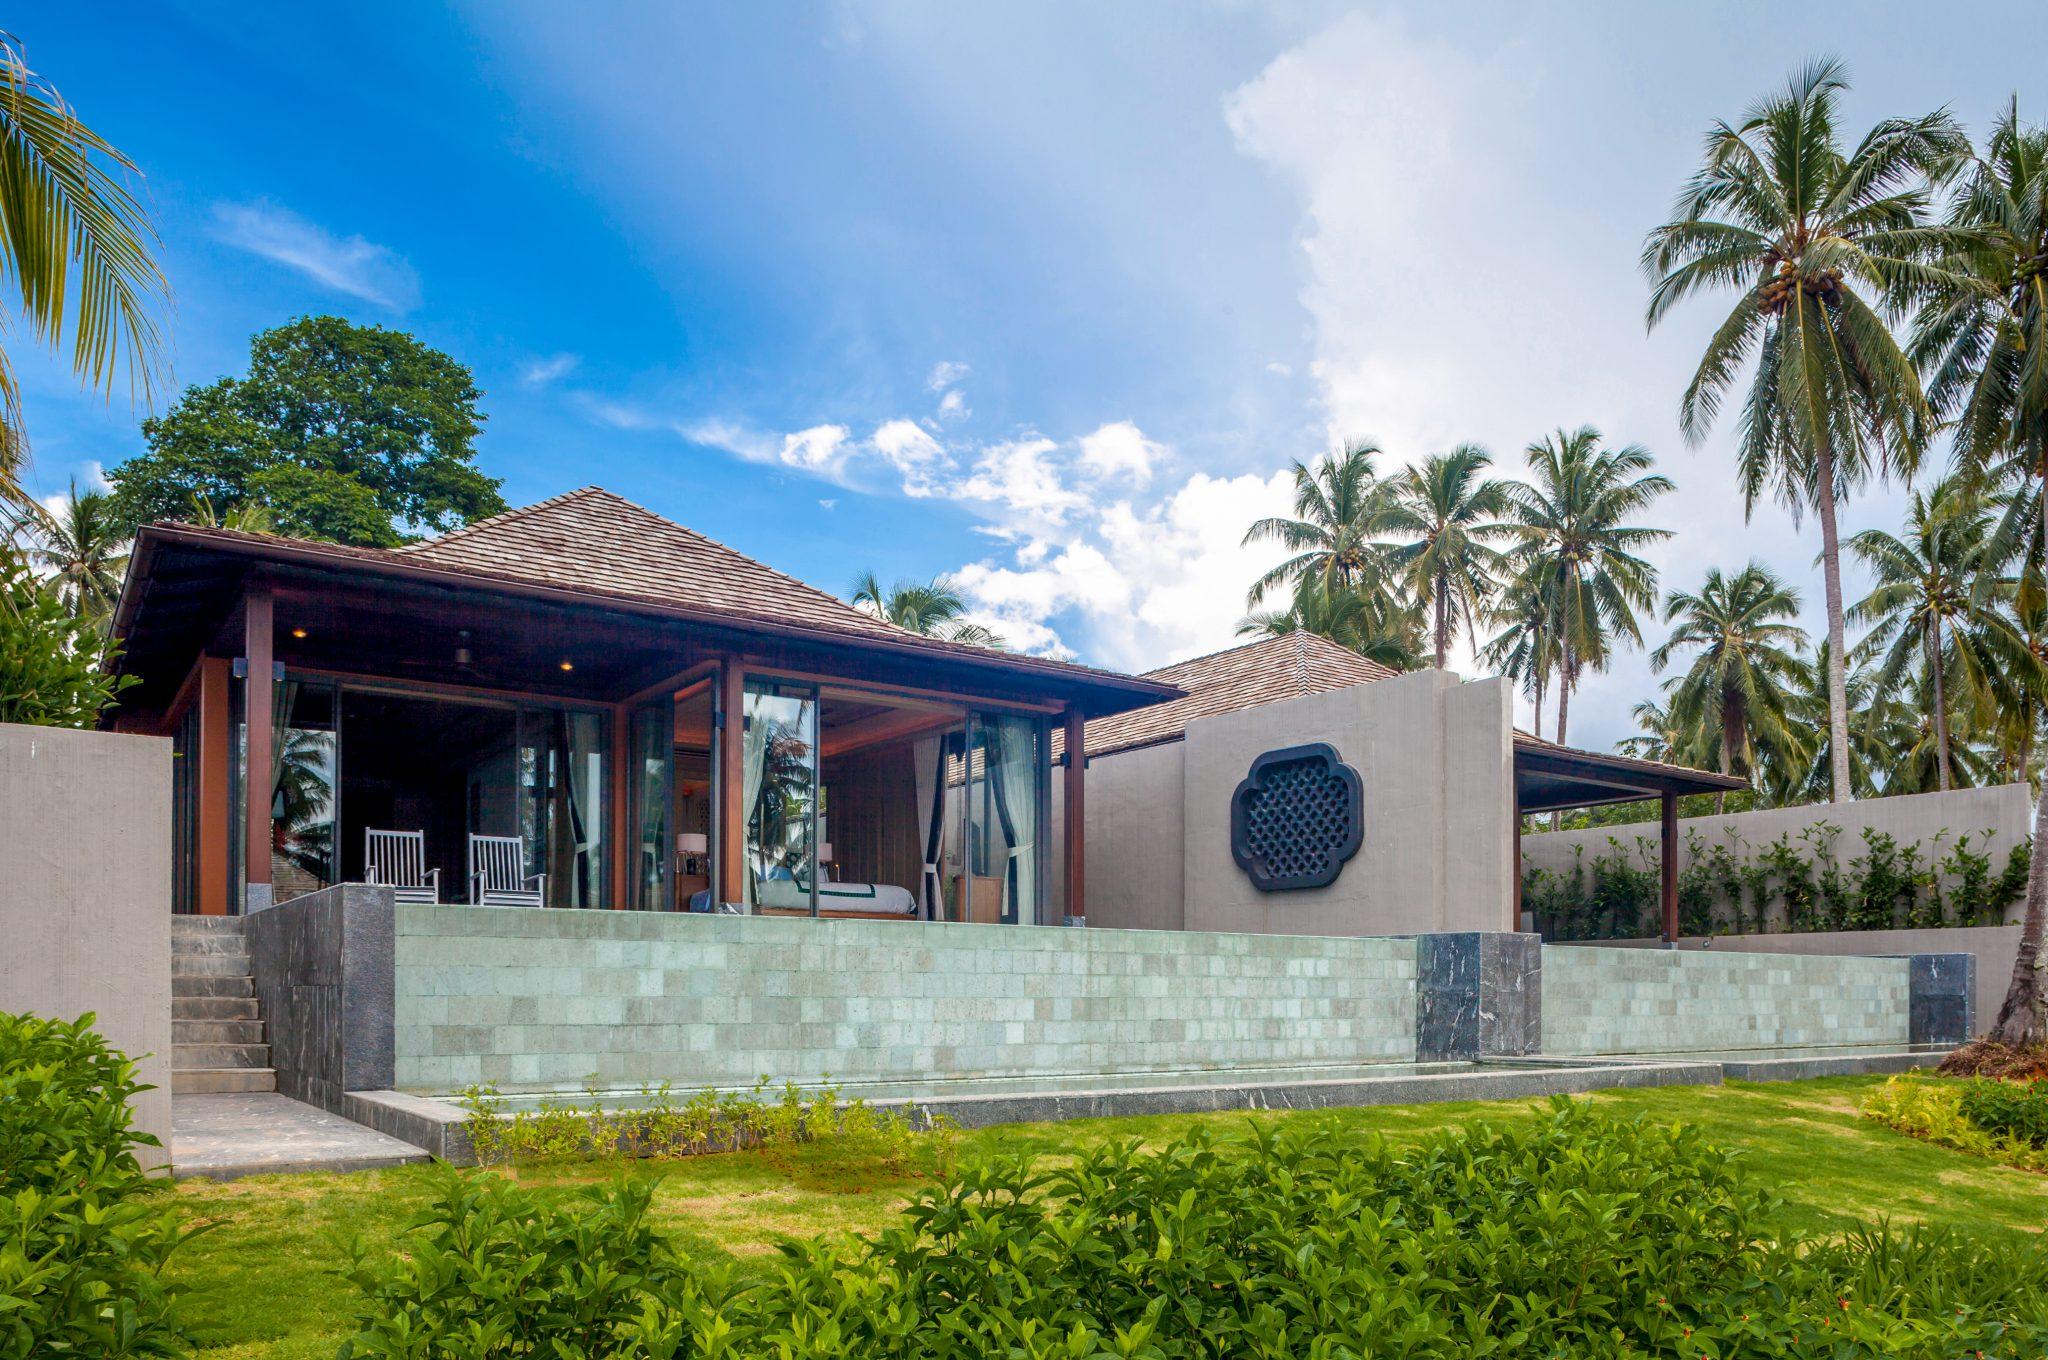 Phuket Real Estate Agency – Natai Beach (4)